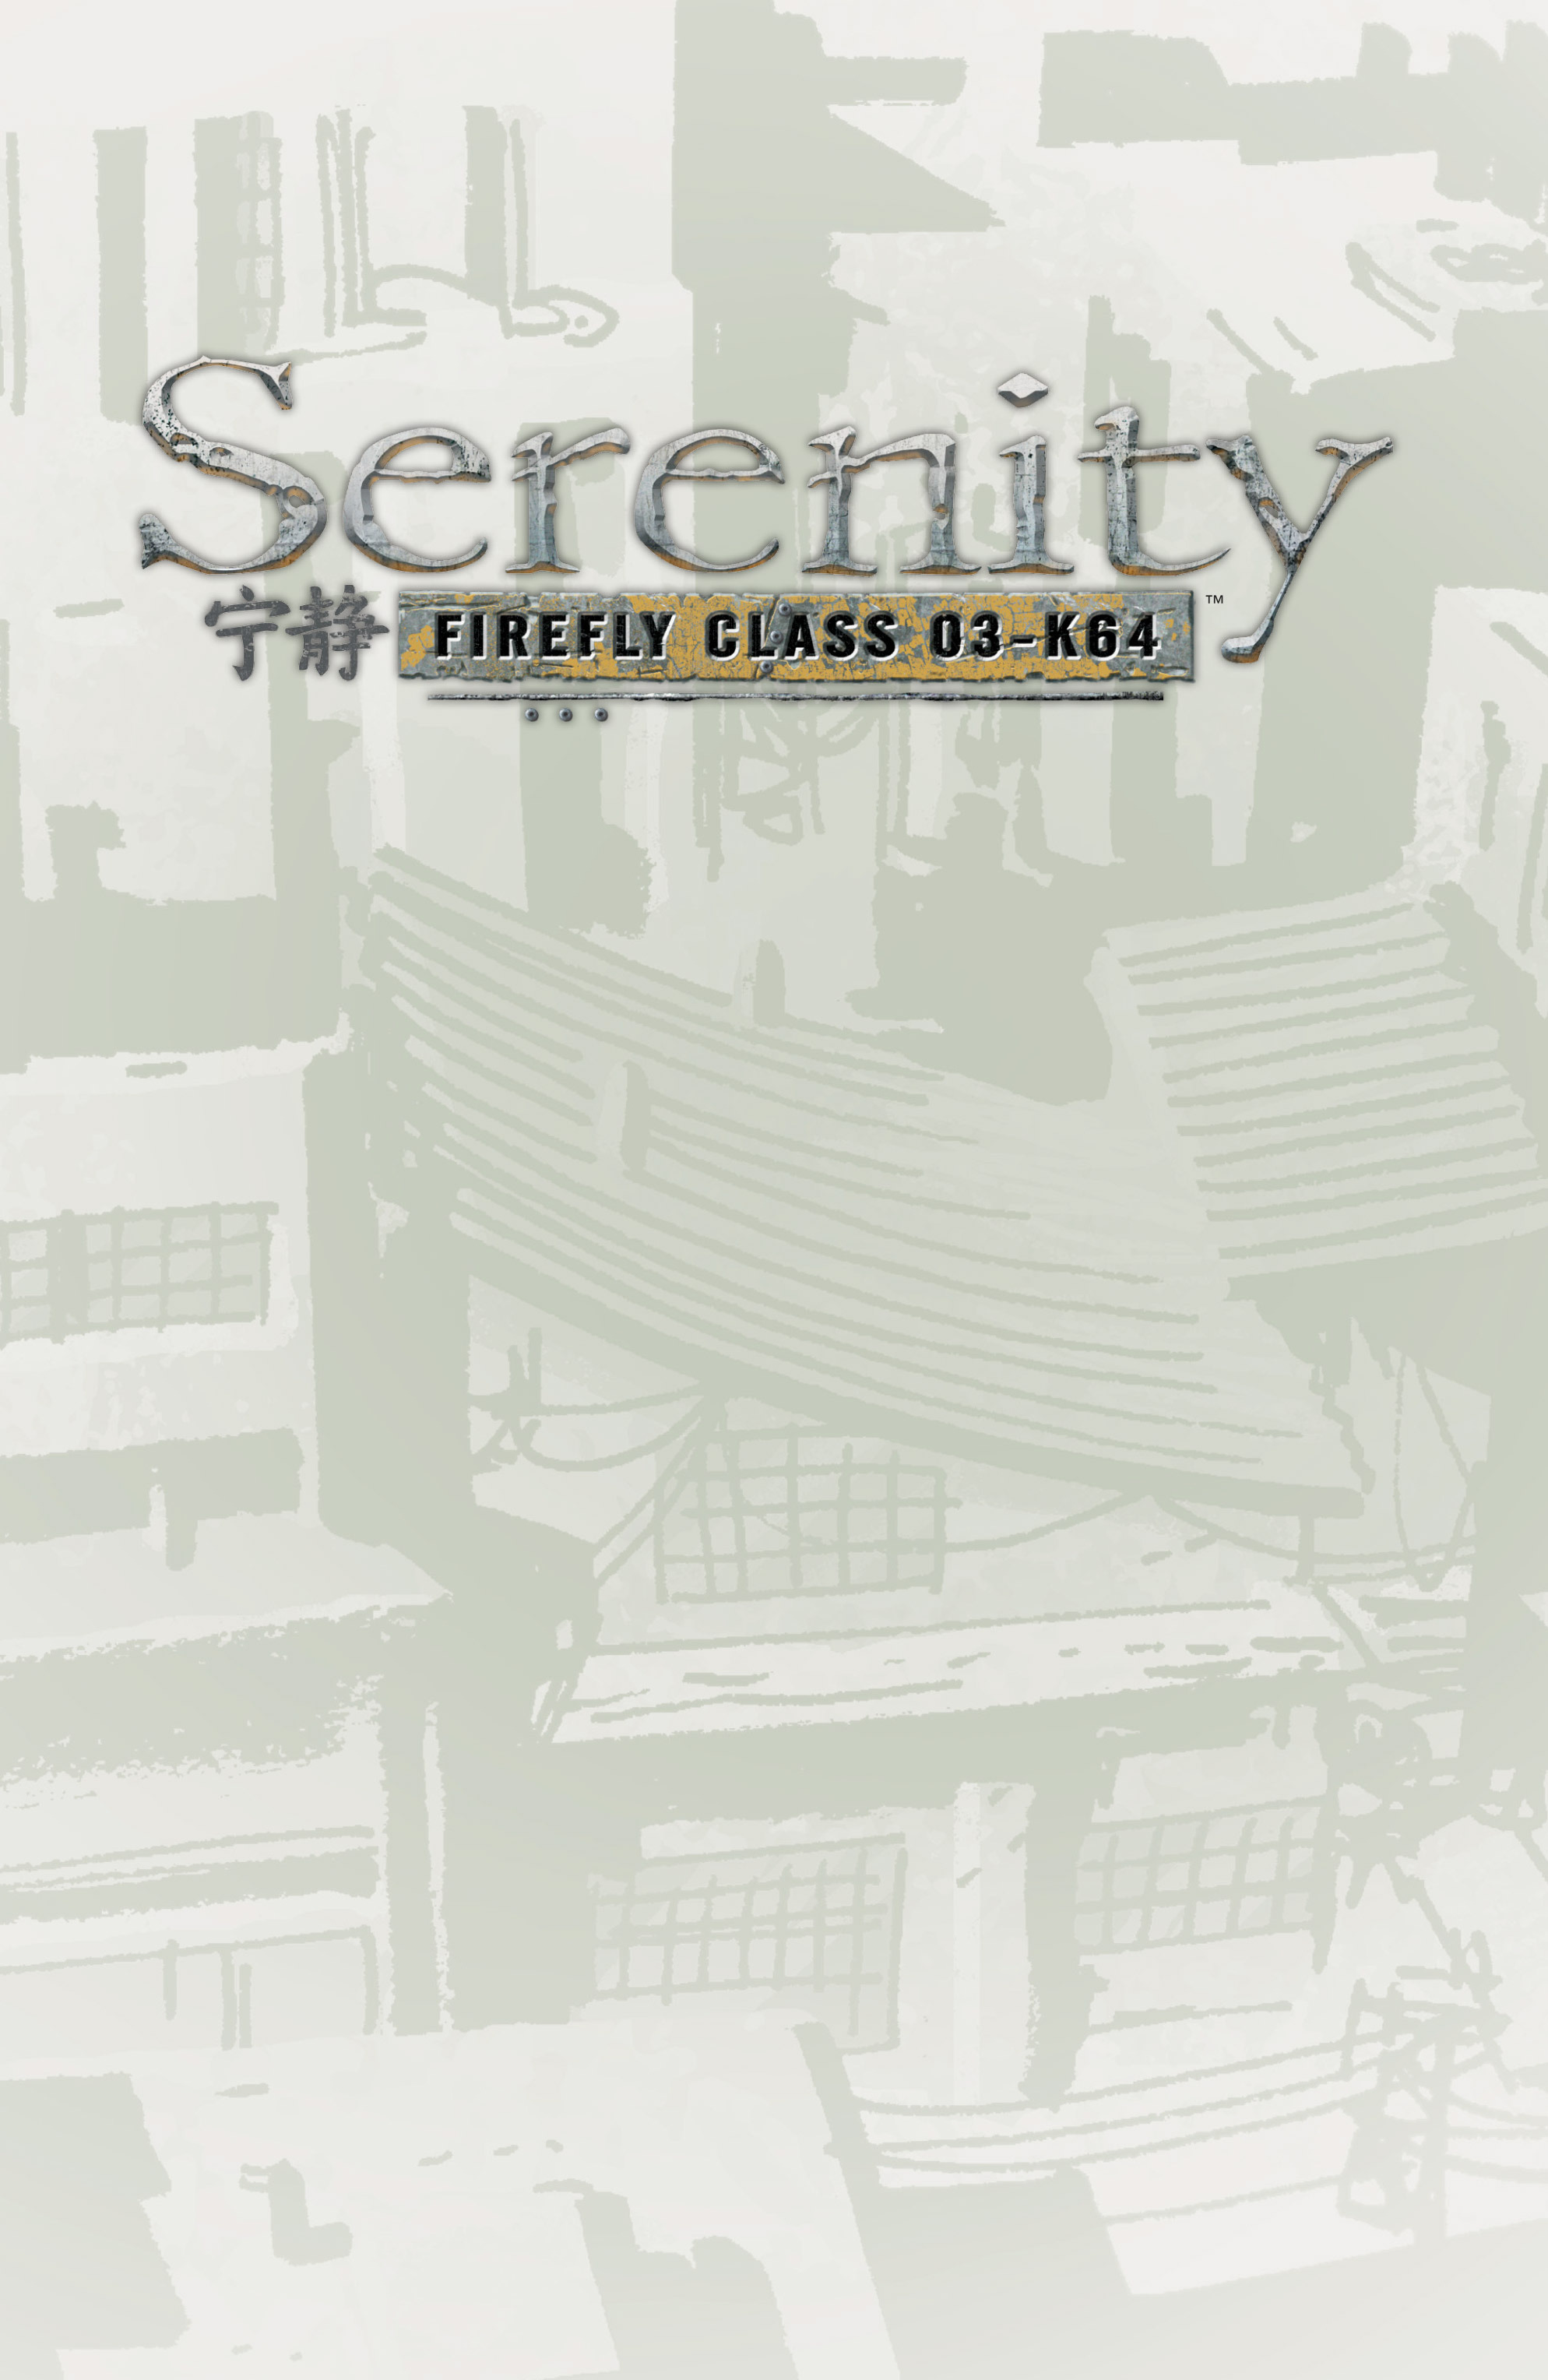 Read online Serenity Volume Three: The Shepherd's Tale comic -  Issue # TPB - 3